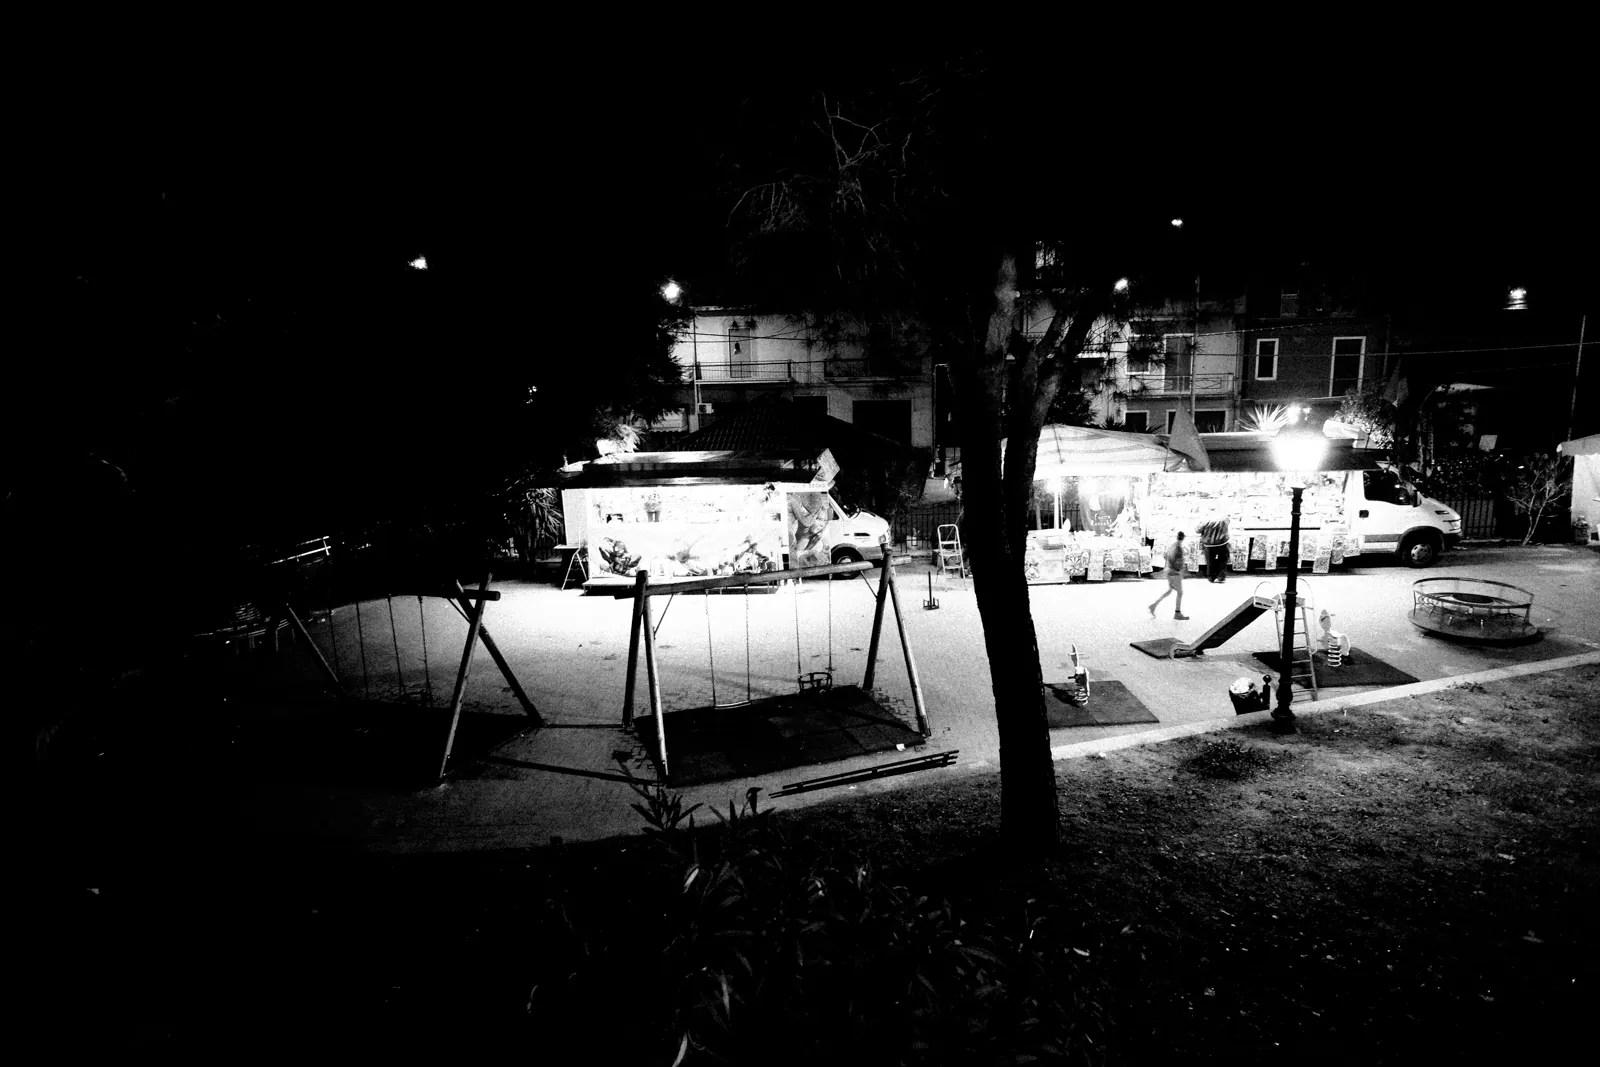 DSCF0580 - COME TRATTARE IL RUMORE DIGITALE IN STREET PHOTOGRAPHY - fotostreet.it